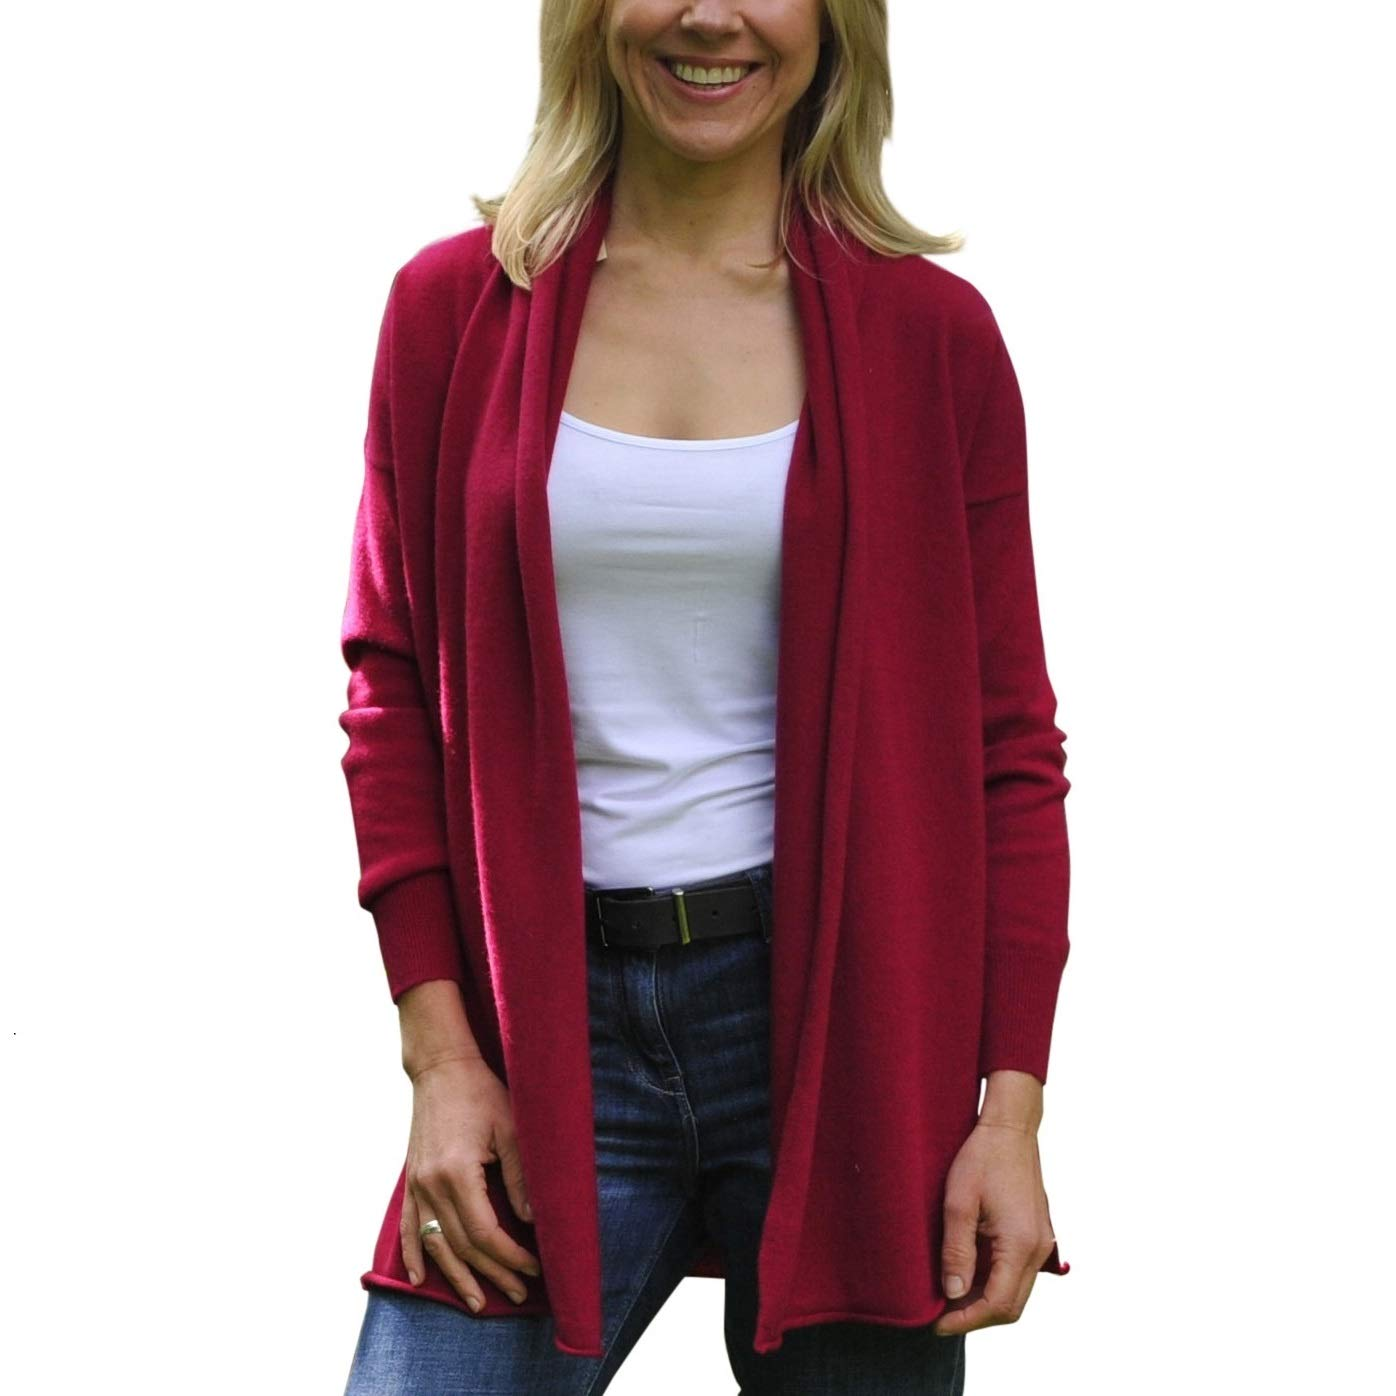 Misty Cashmere Women s Long Cashmere Cardigan  Amazon.co.uk  Clothing 86f7075d8